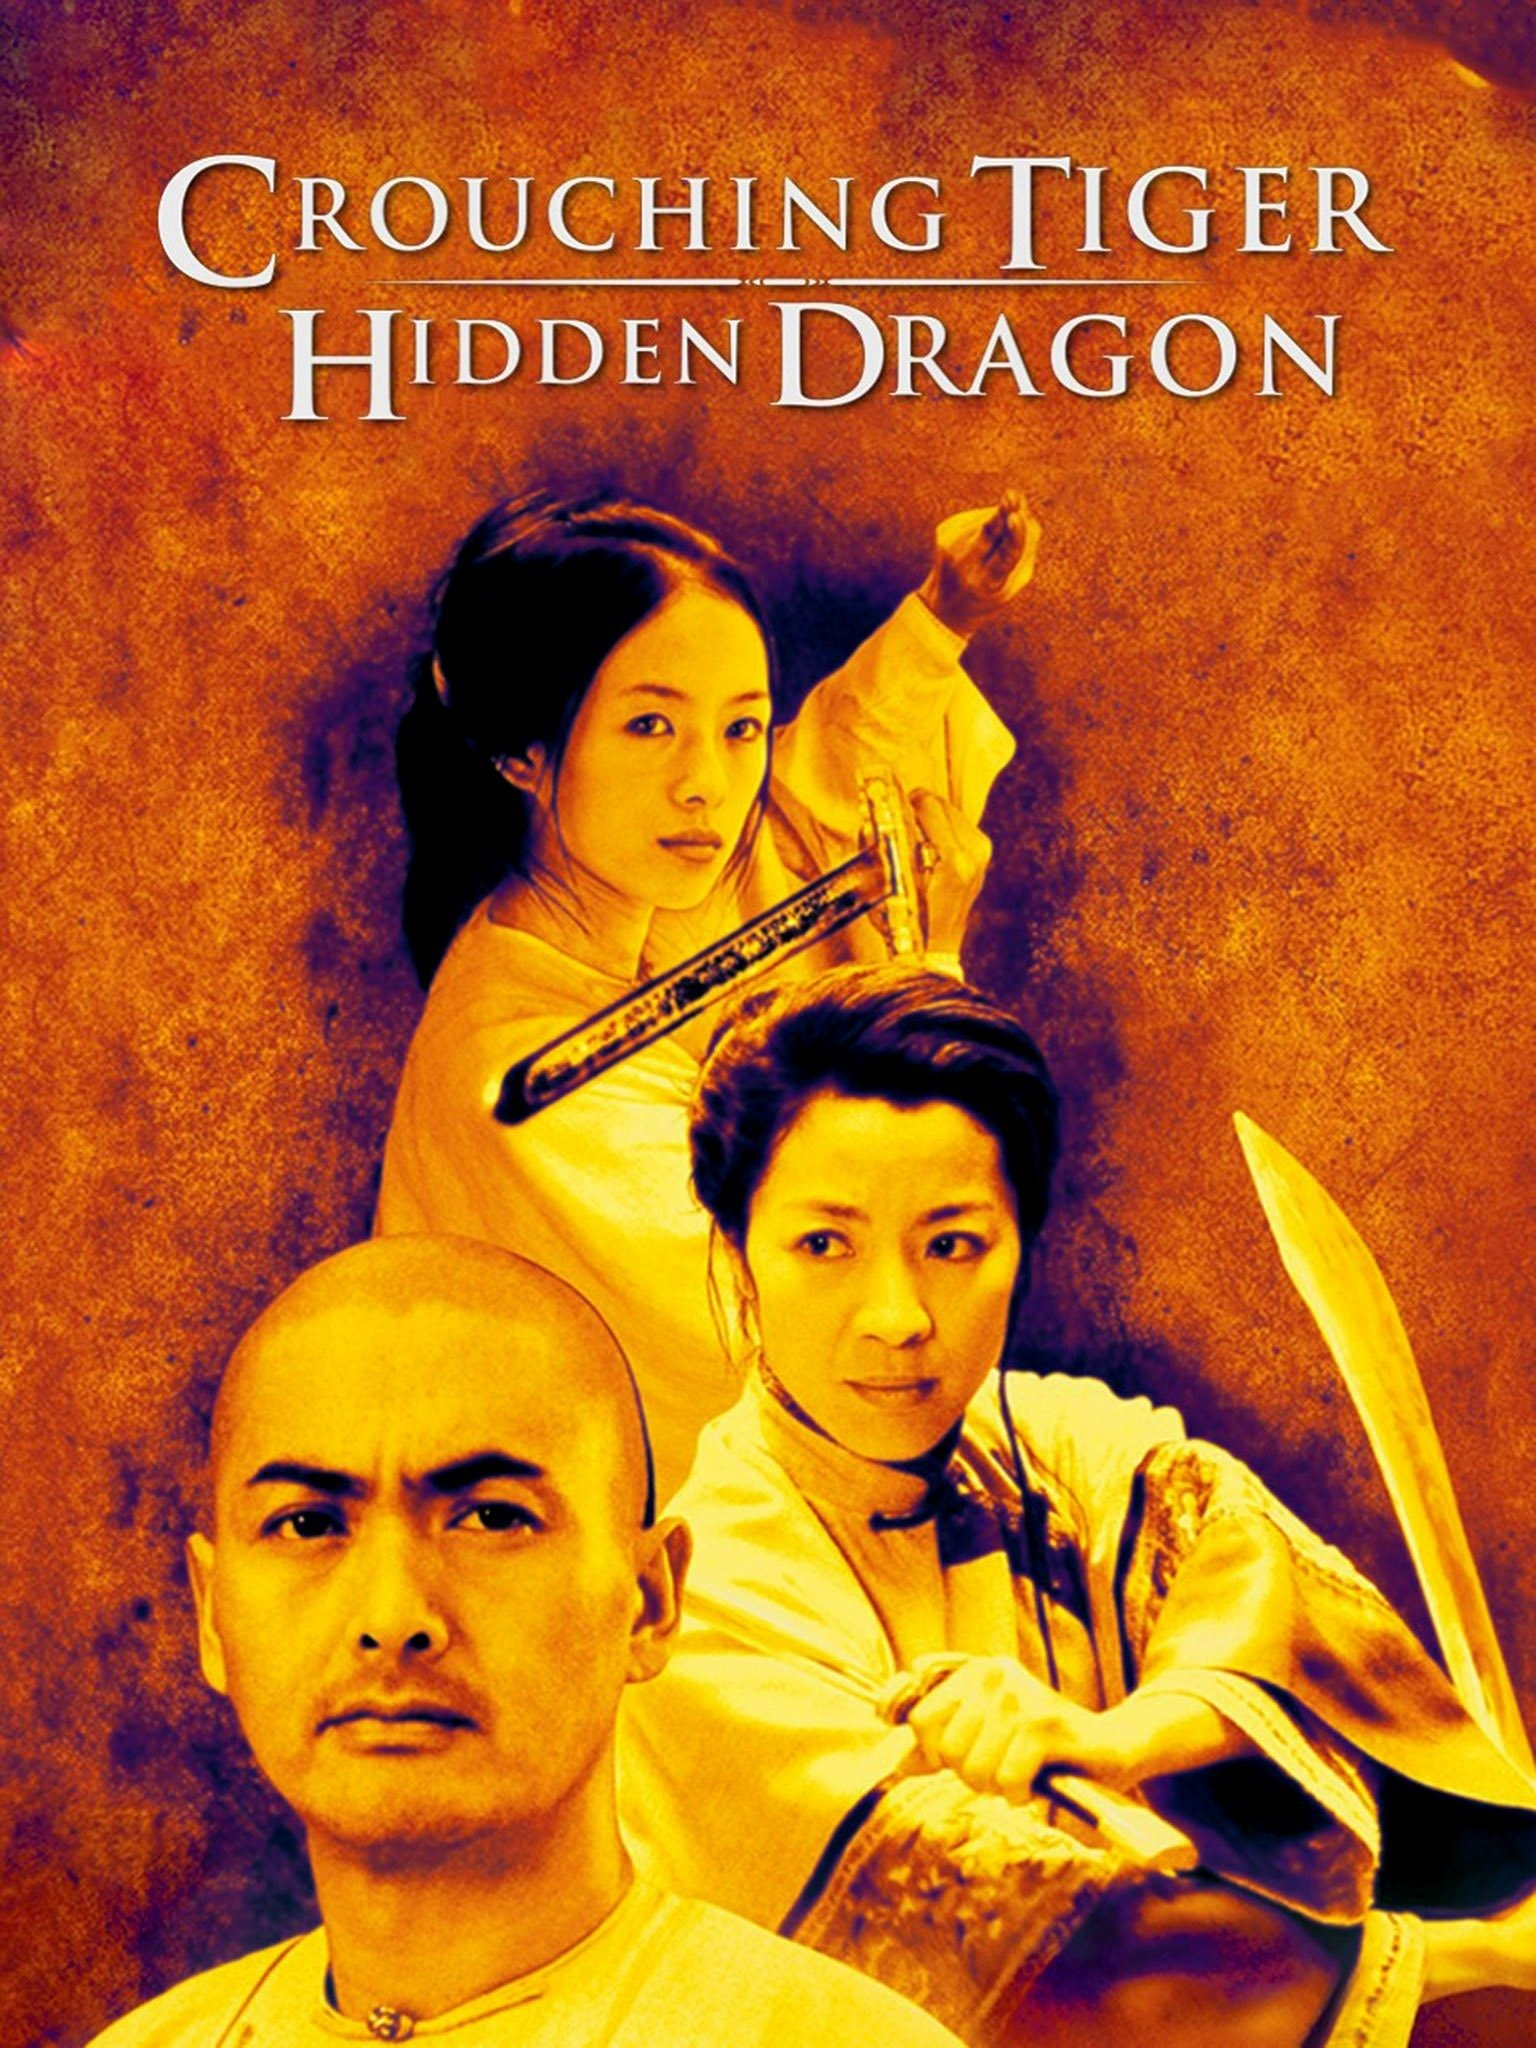 Crouching_Tiger_Hidden_Dragon_2000_7428399.jpg